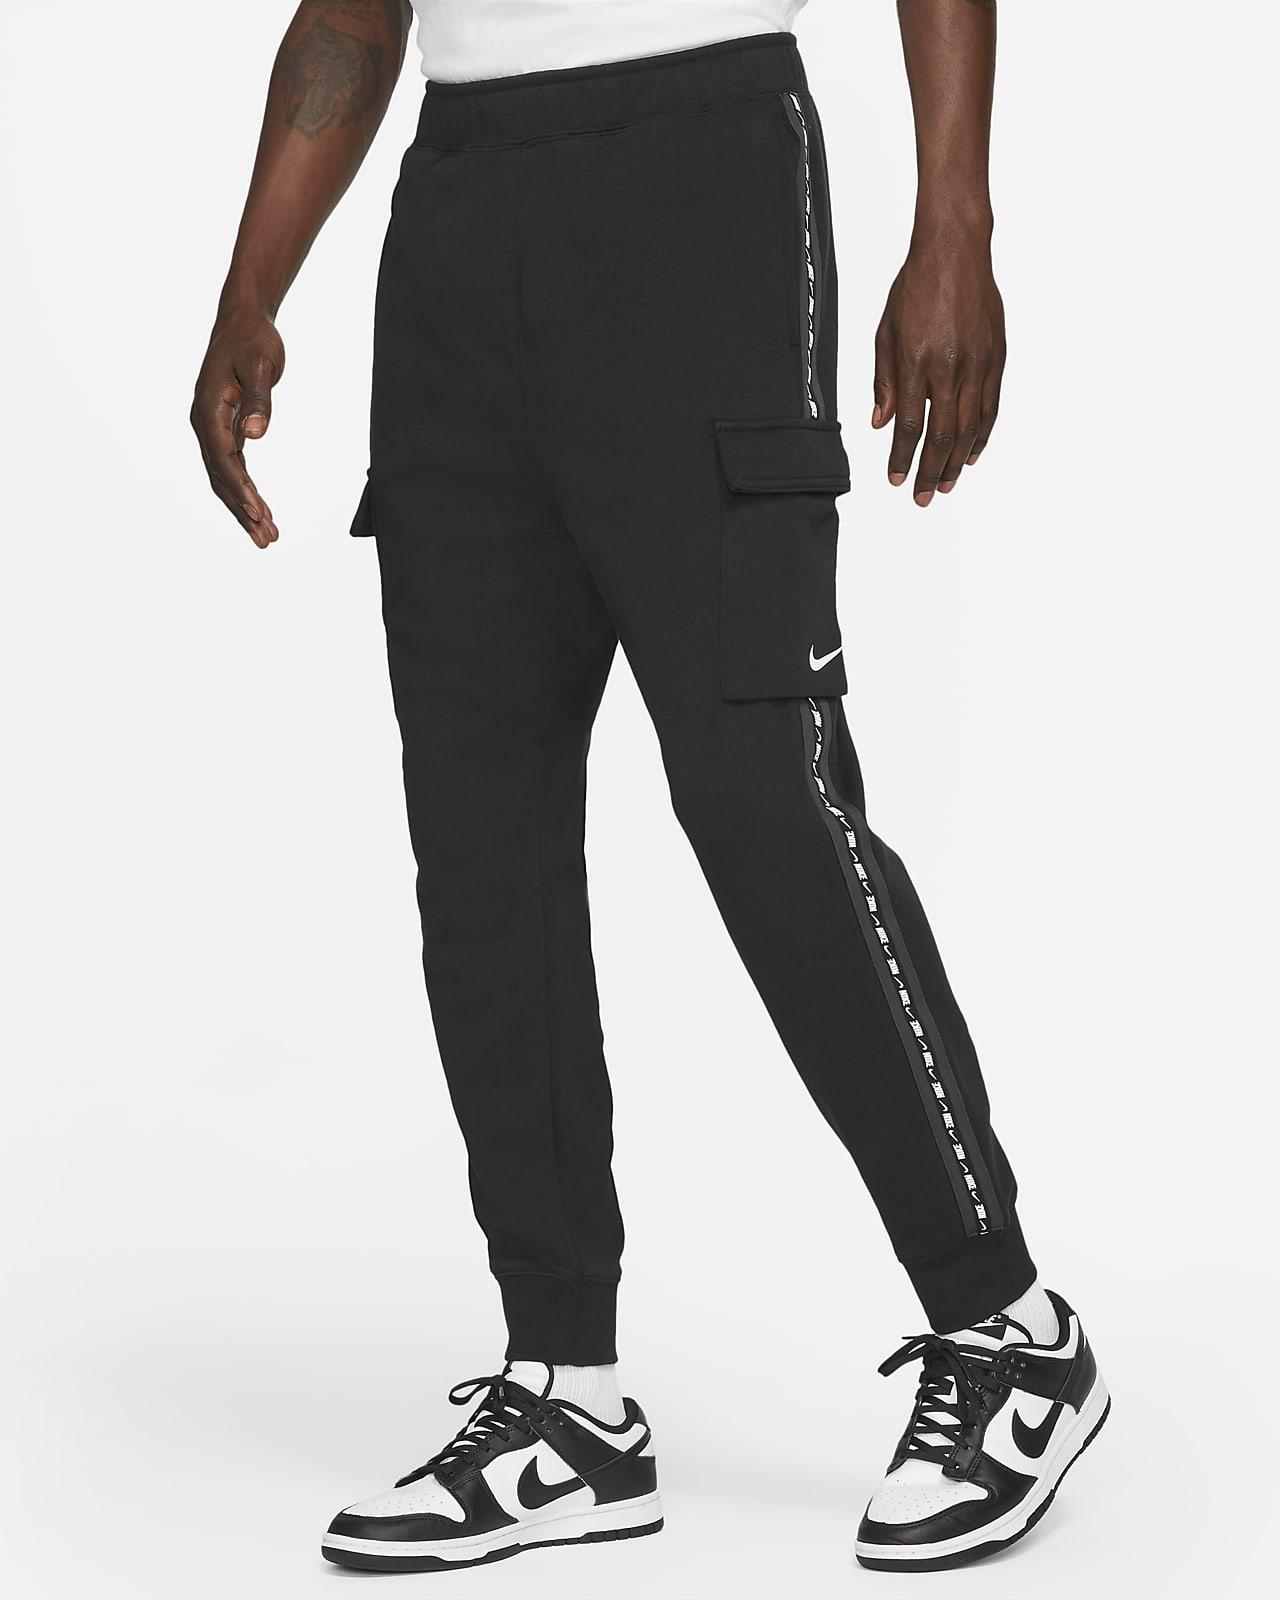 Pantaloni cargo in fleece Nike Sportswear - Uomo